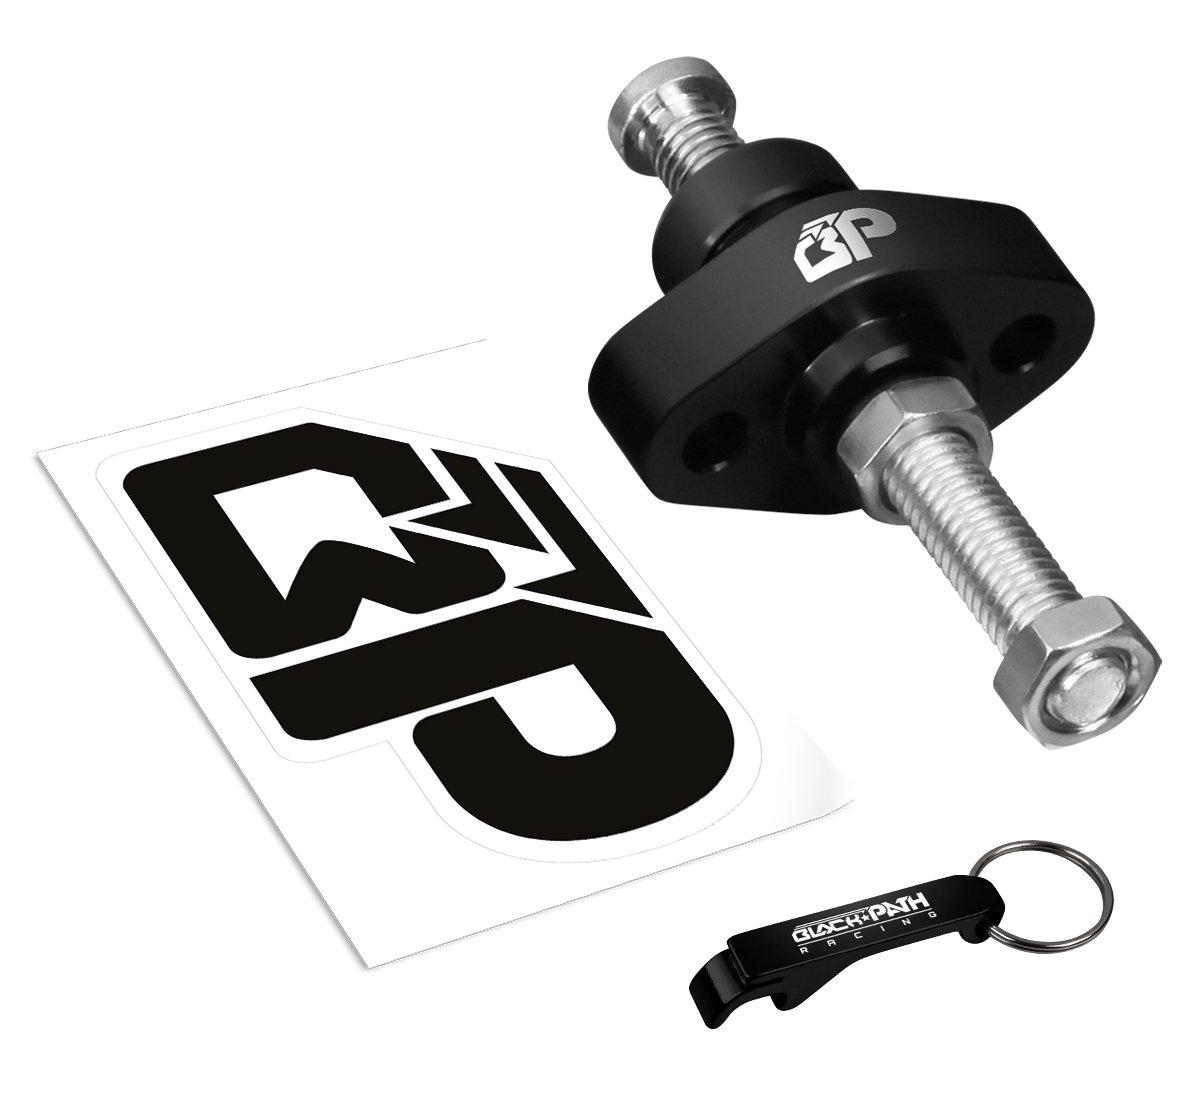 BlackPath - Kawasaki Manual Adjustable Chain Tensioner Kit Ninja ZX-6R + ZX6RR + 636 Motorcycle Valve Timing (Black) T6 Billet